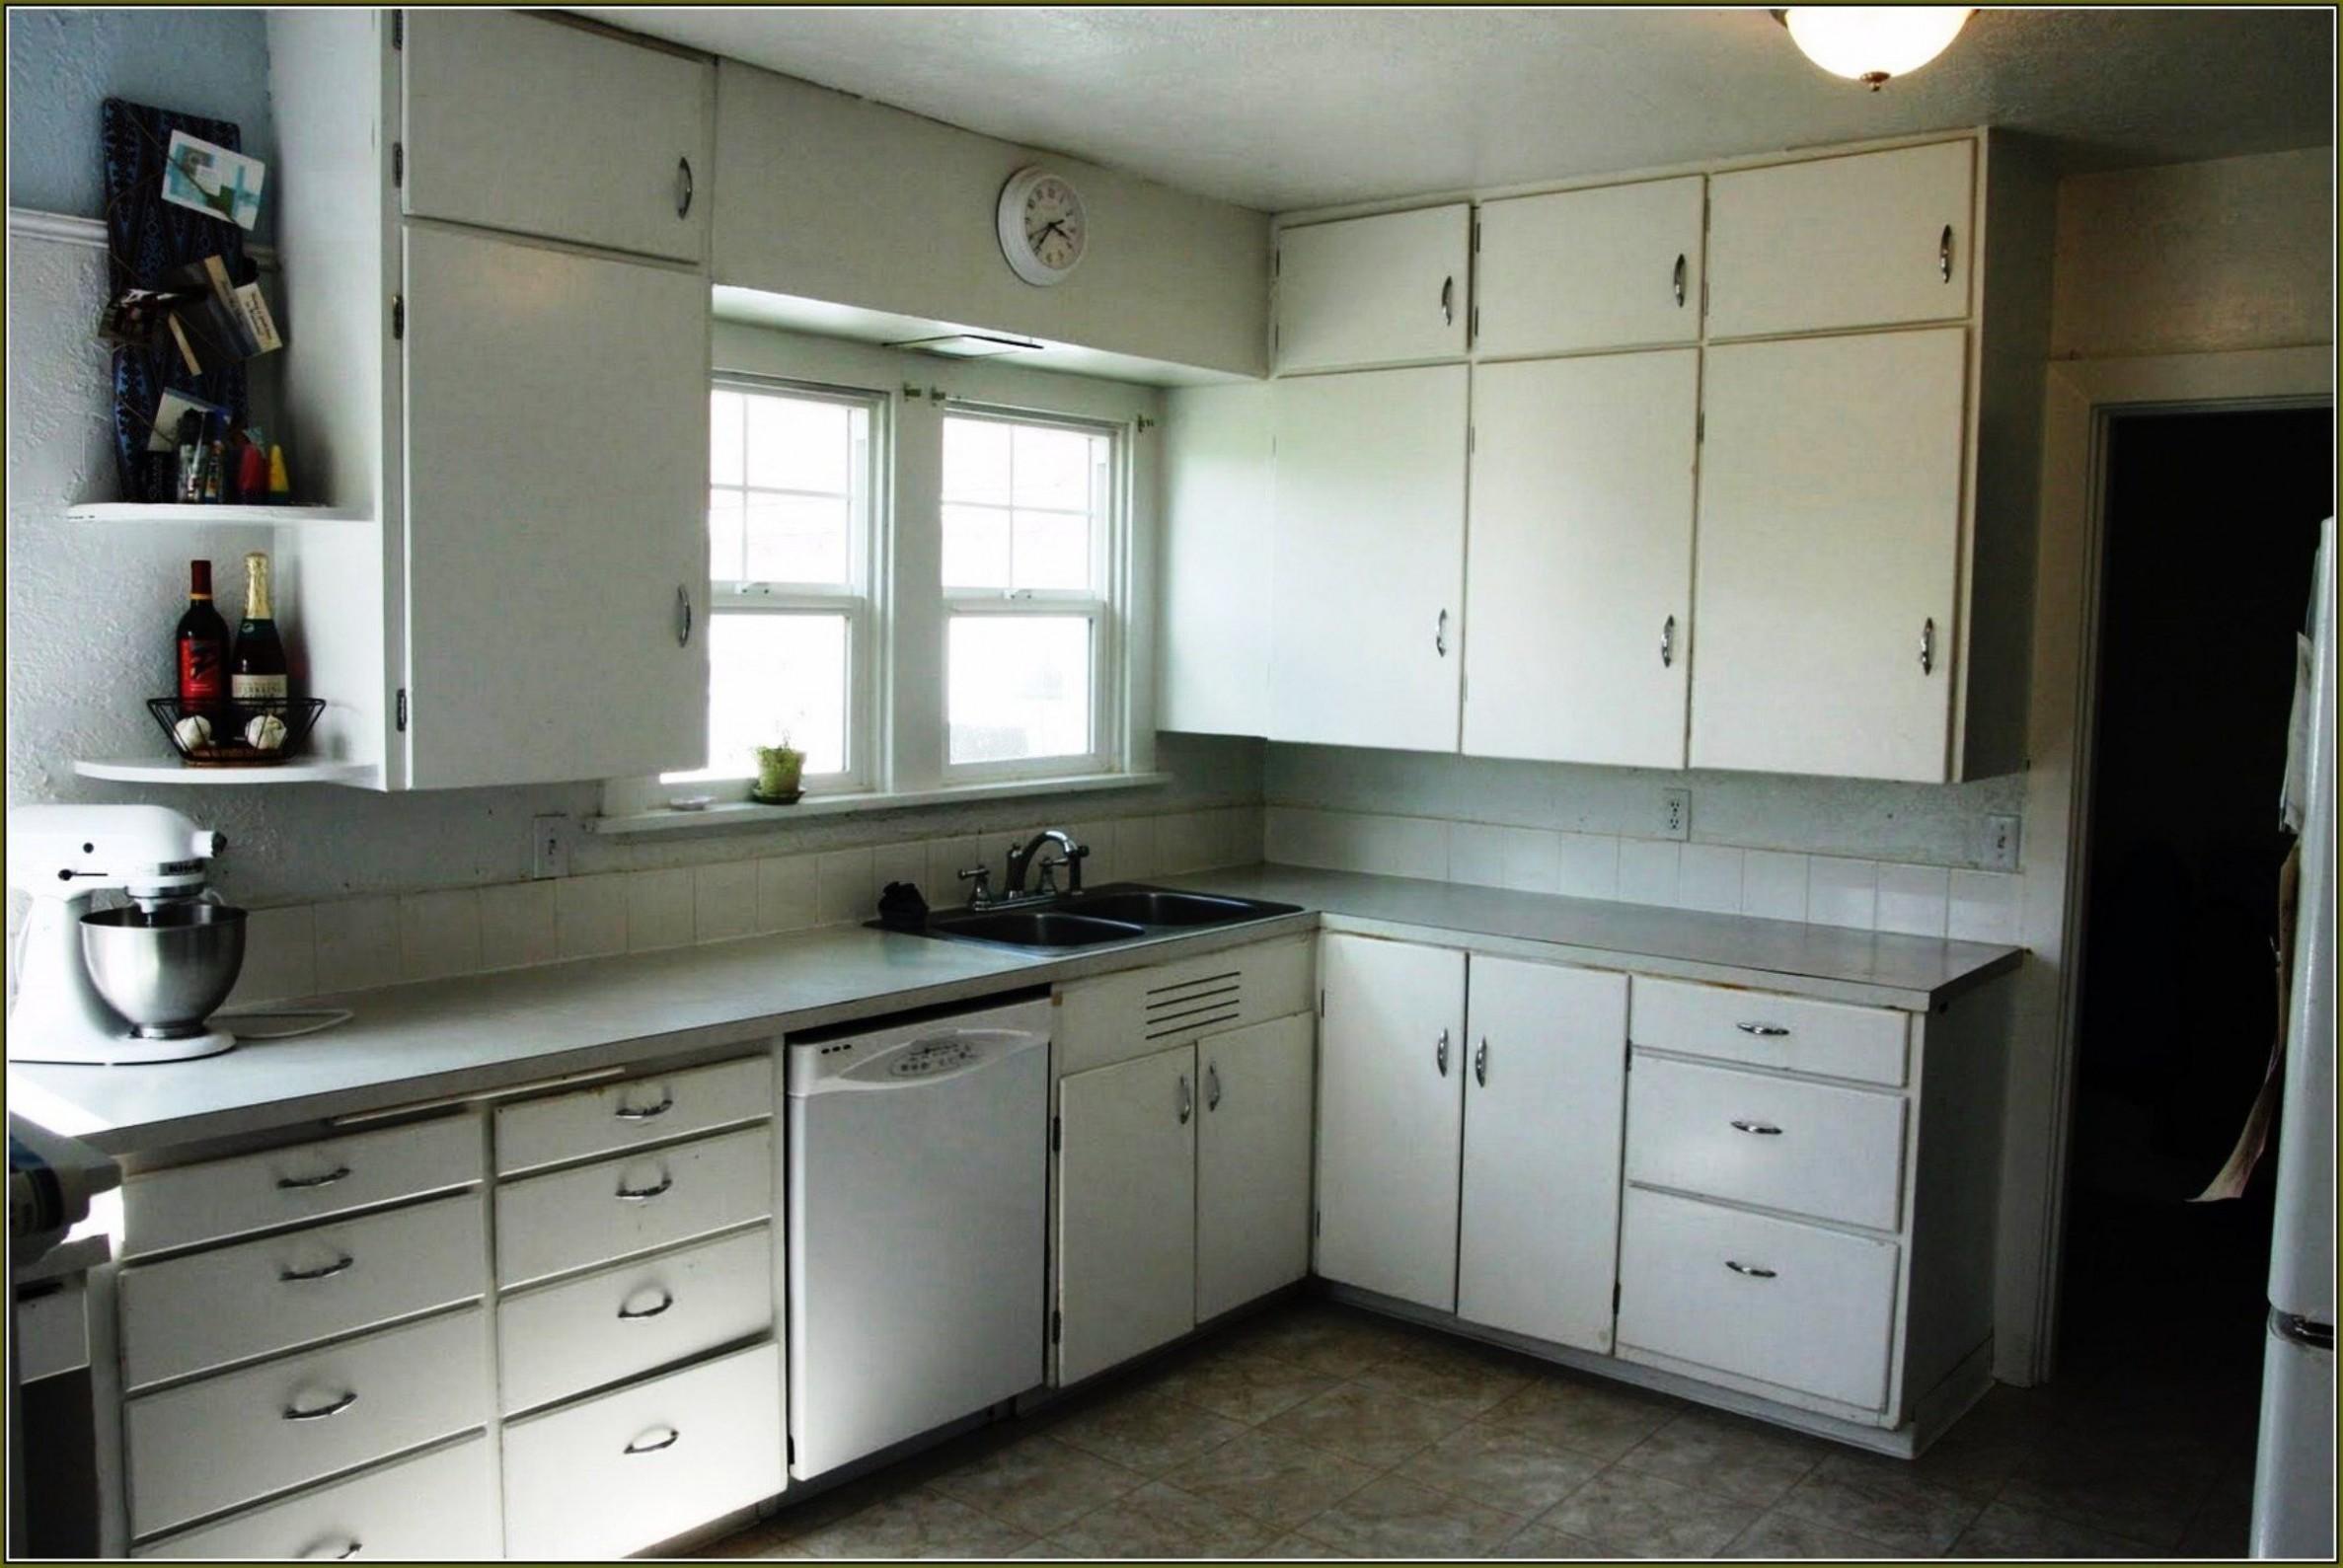 Used Kitchen Cabinets for Sale: Secondhand Kitchen Set - Home  - Steel Kitchen Cabinets Craigslist